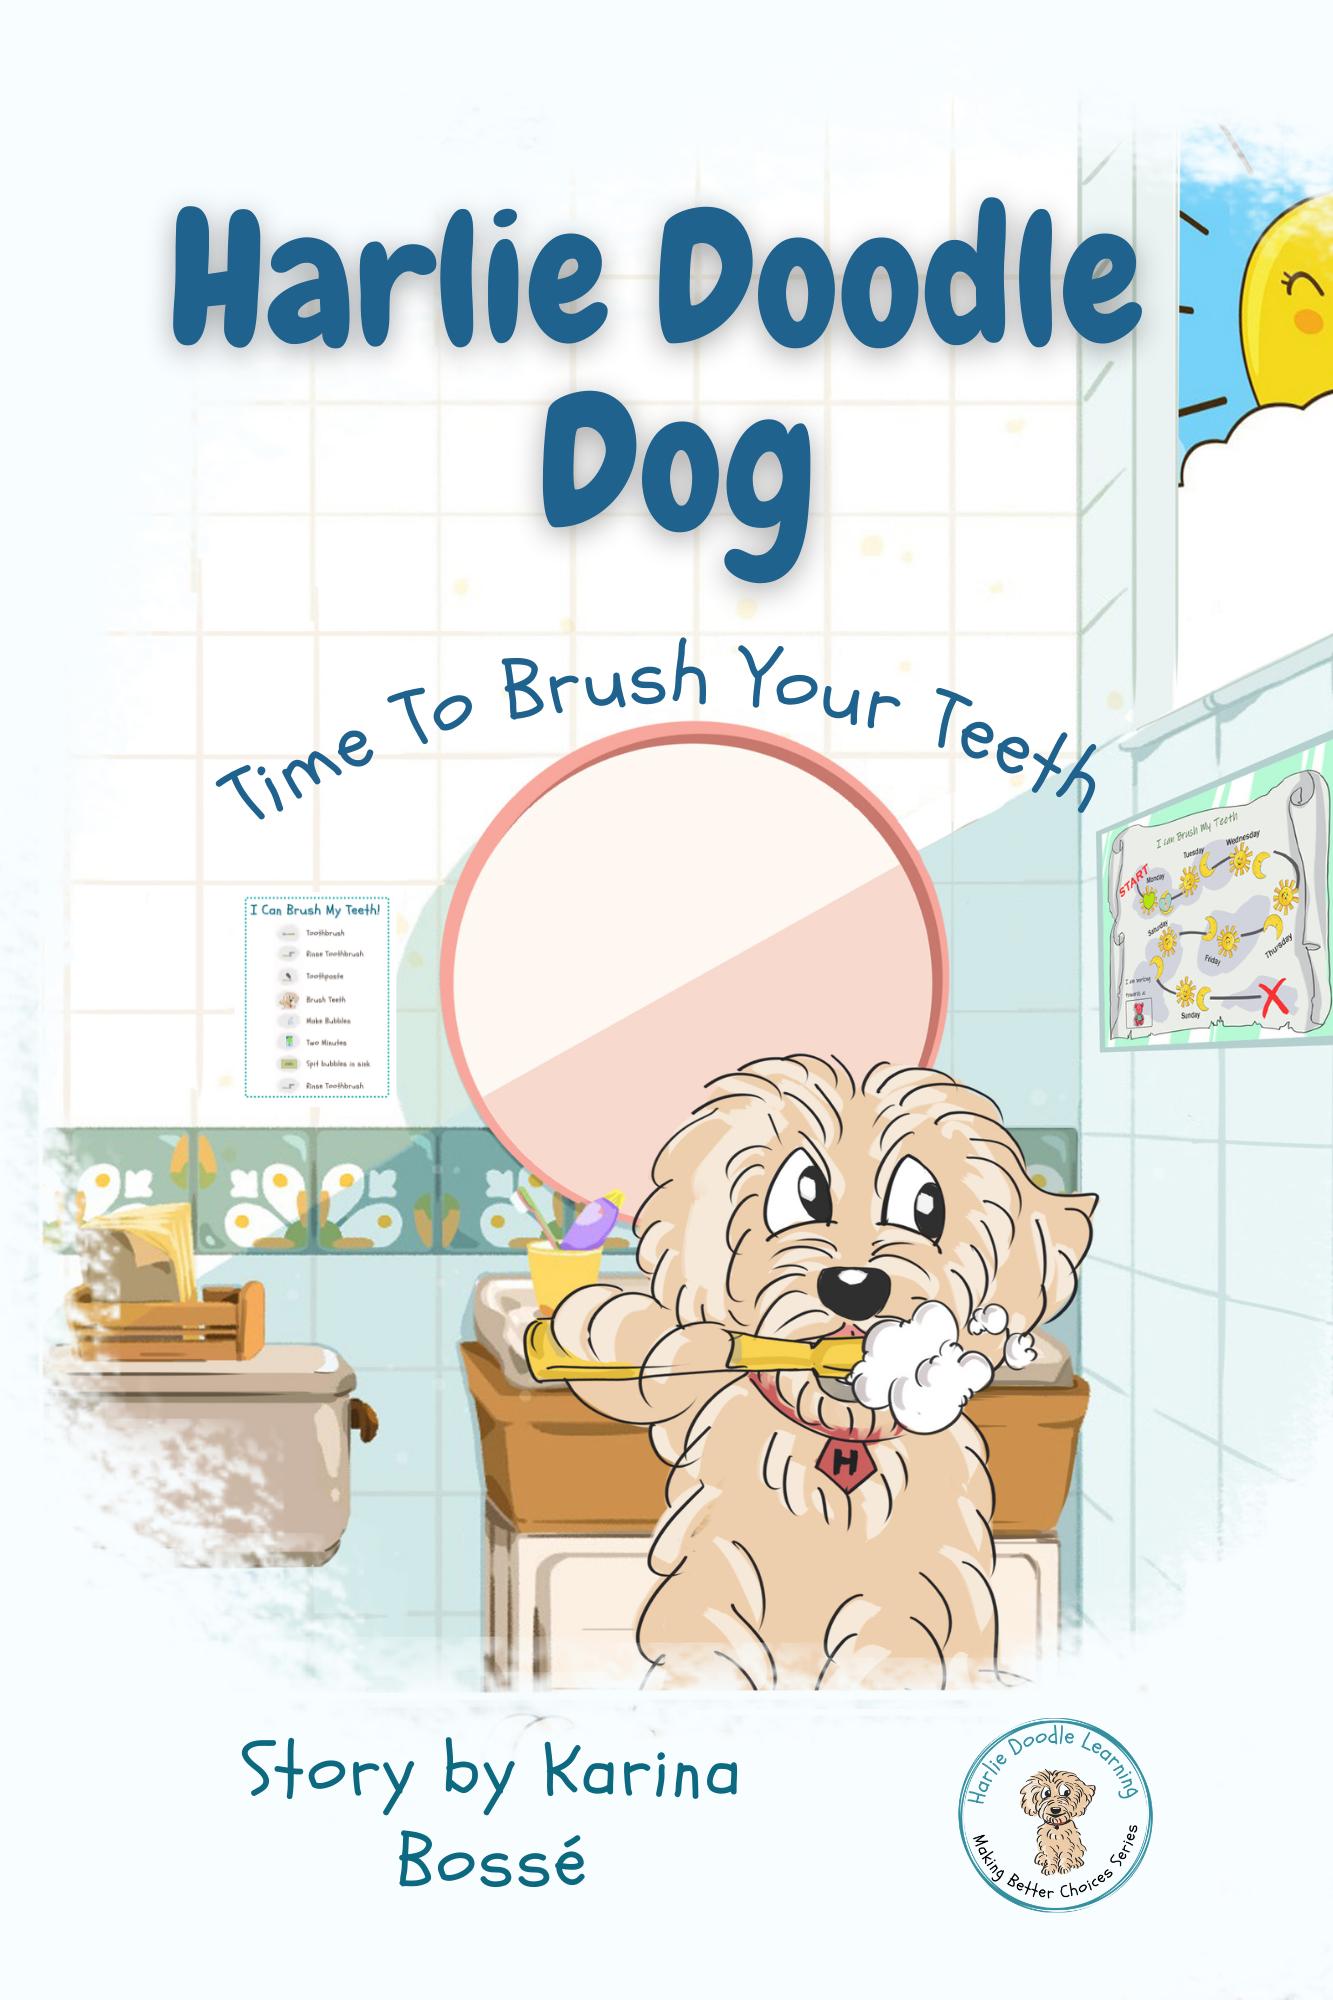 Copy-of-Harlie-Doodle-Dog-Cover-4.png